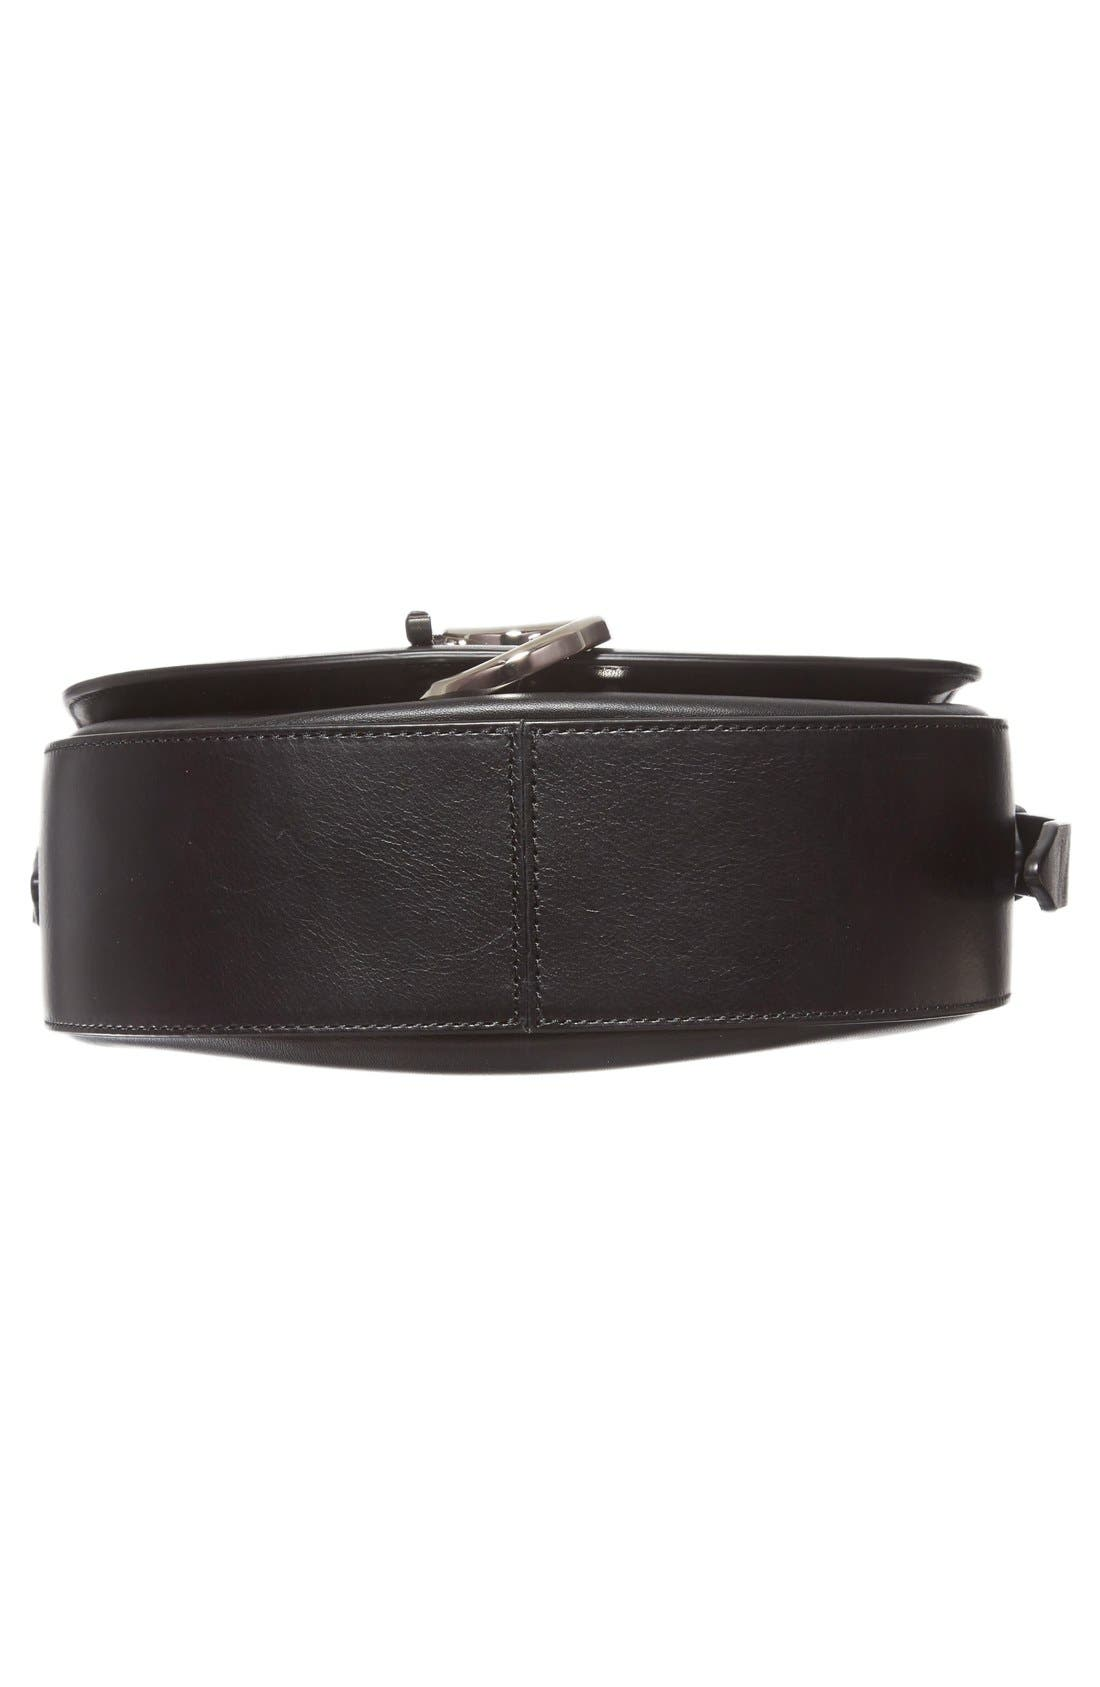 Alix Leather Saddle Bag,                             Alternate thumbnail 6, color,                             001